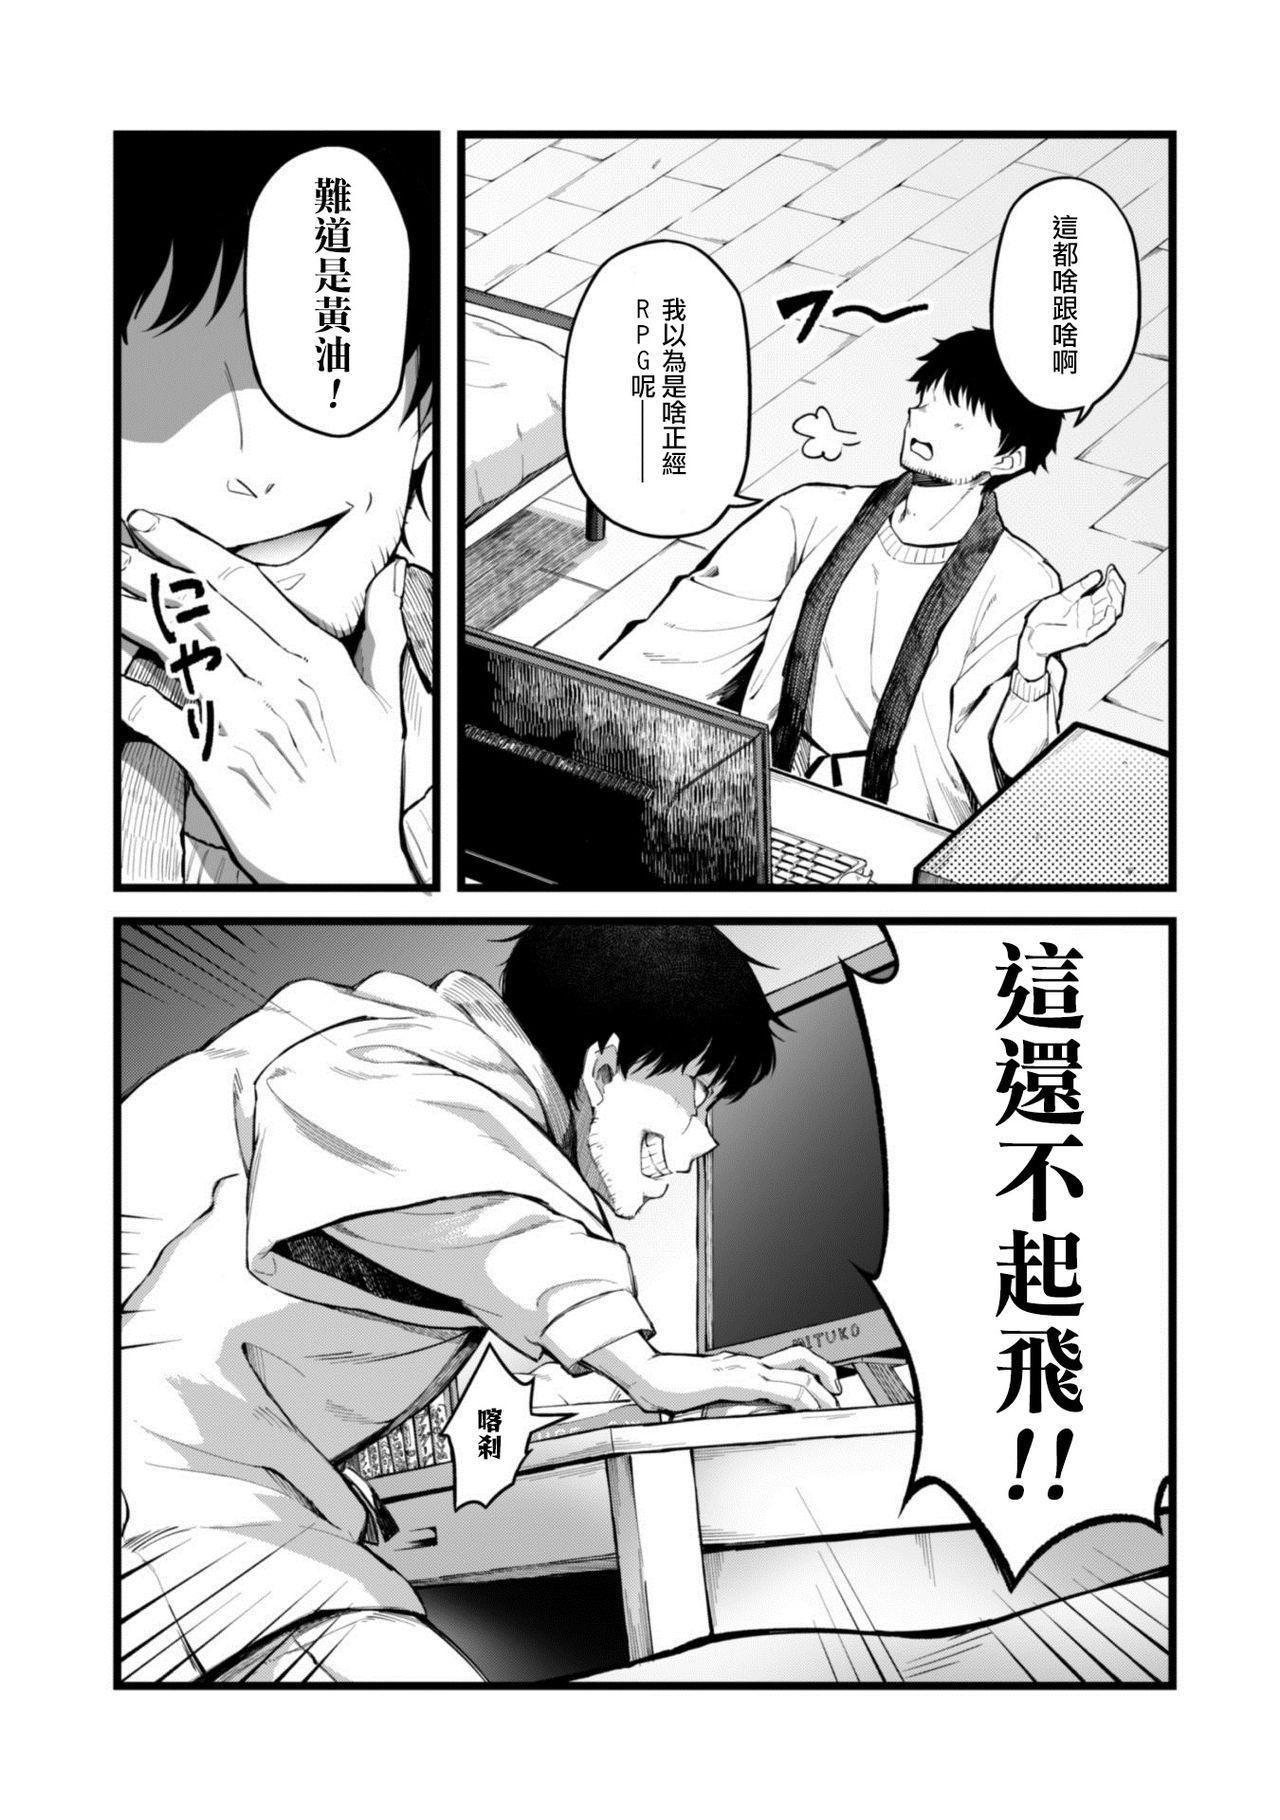 Eroi Skill de Isekai Musou Ch. 1 8